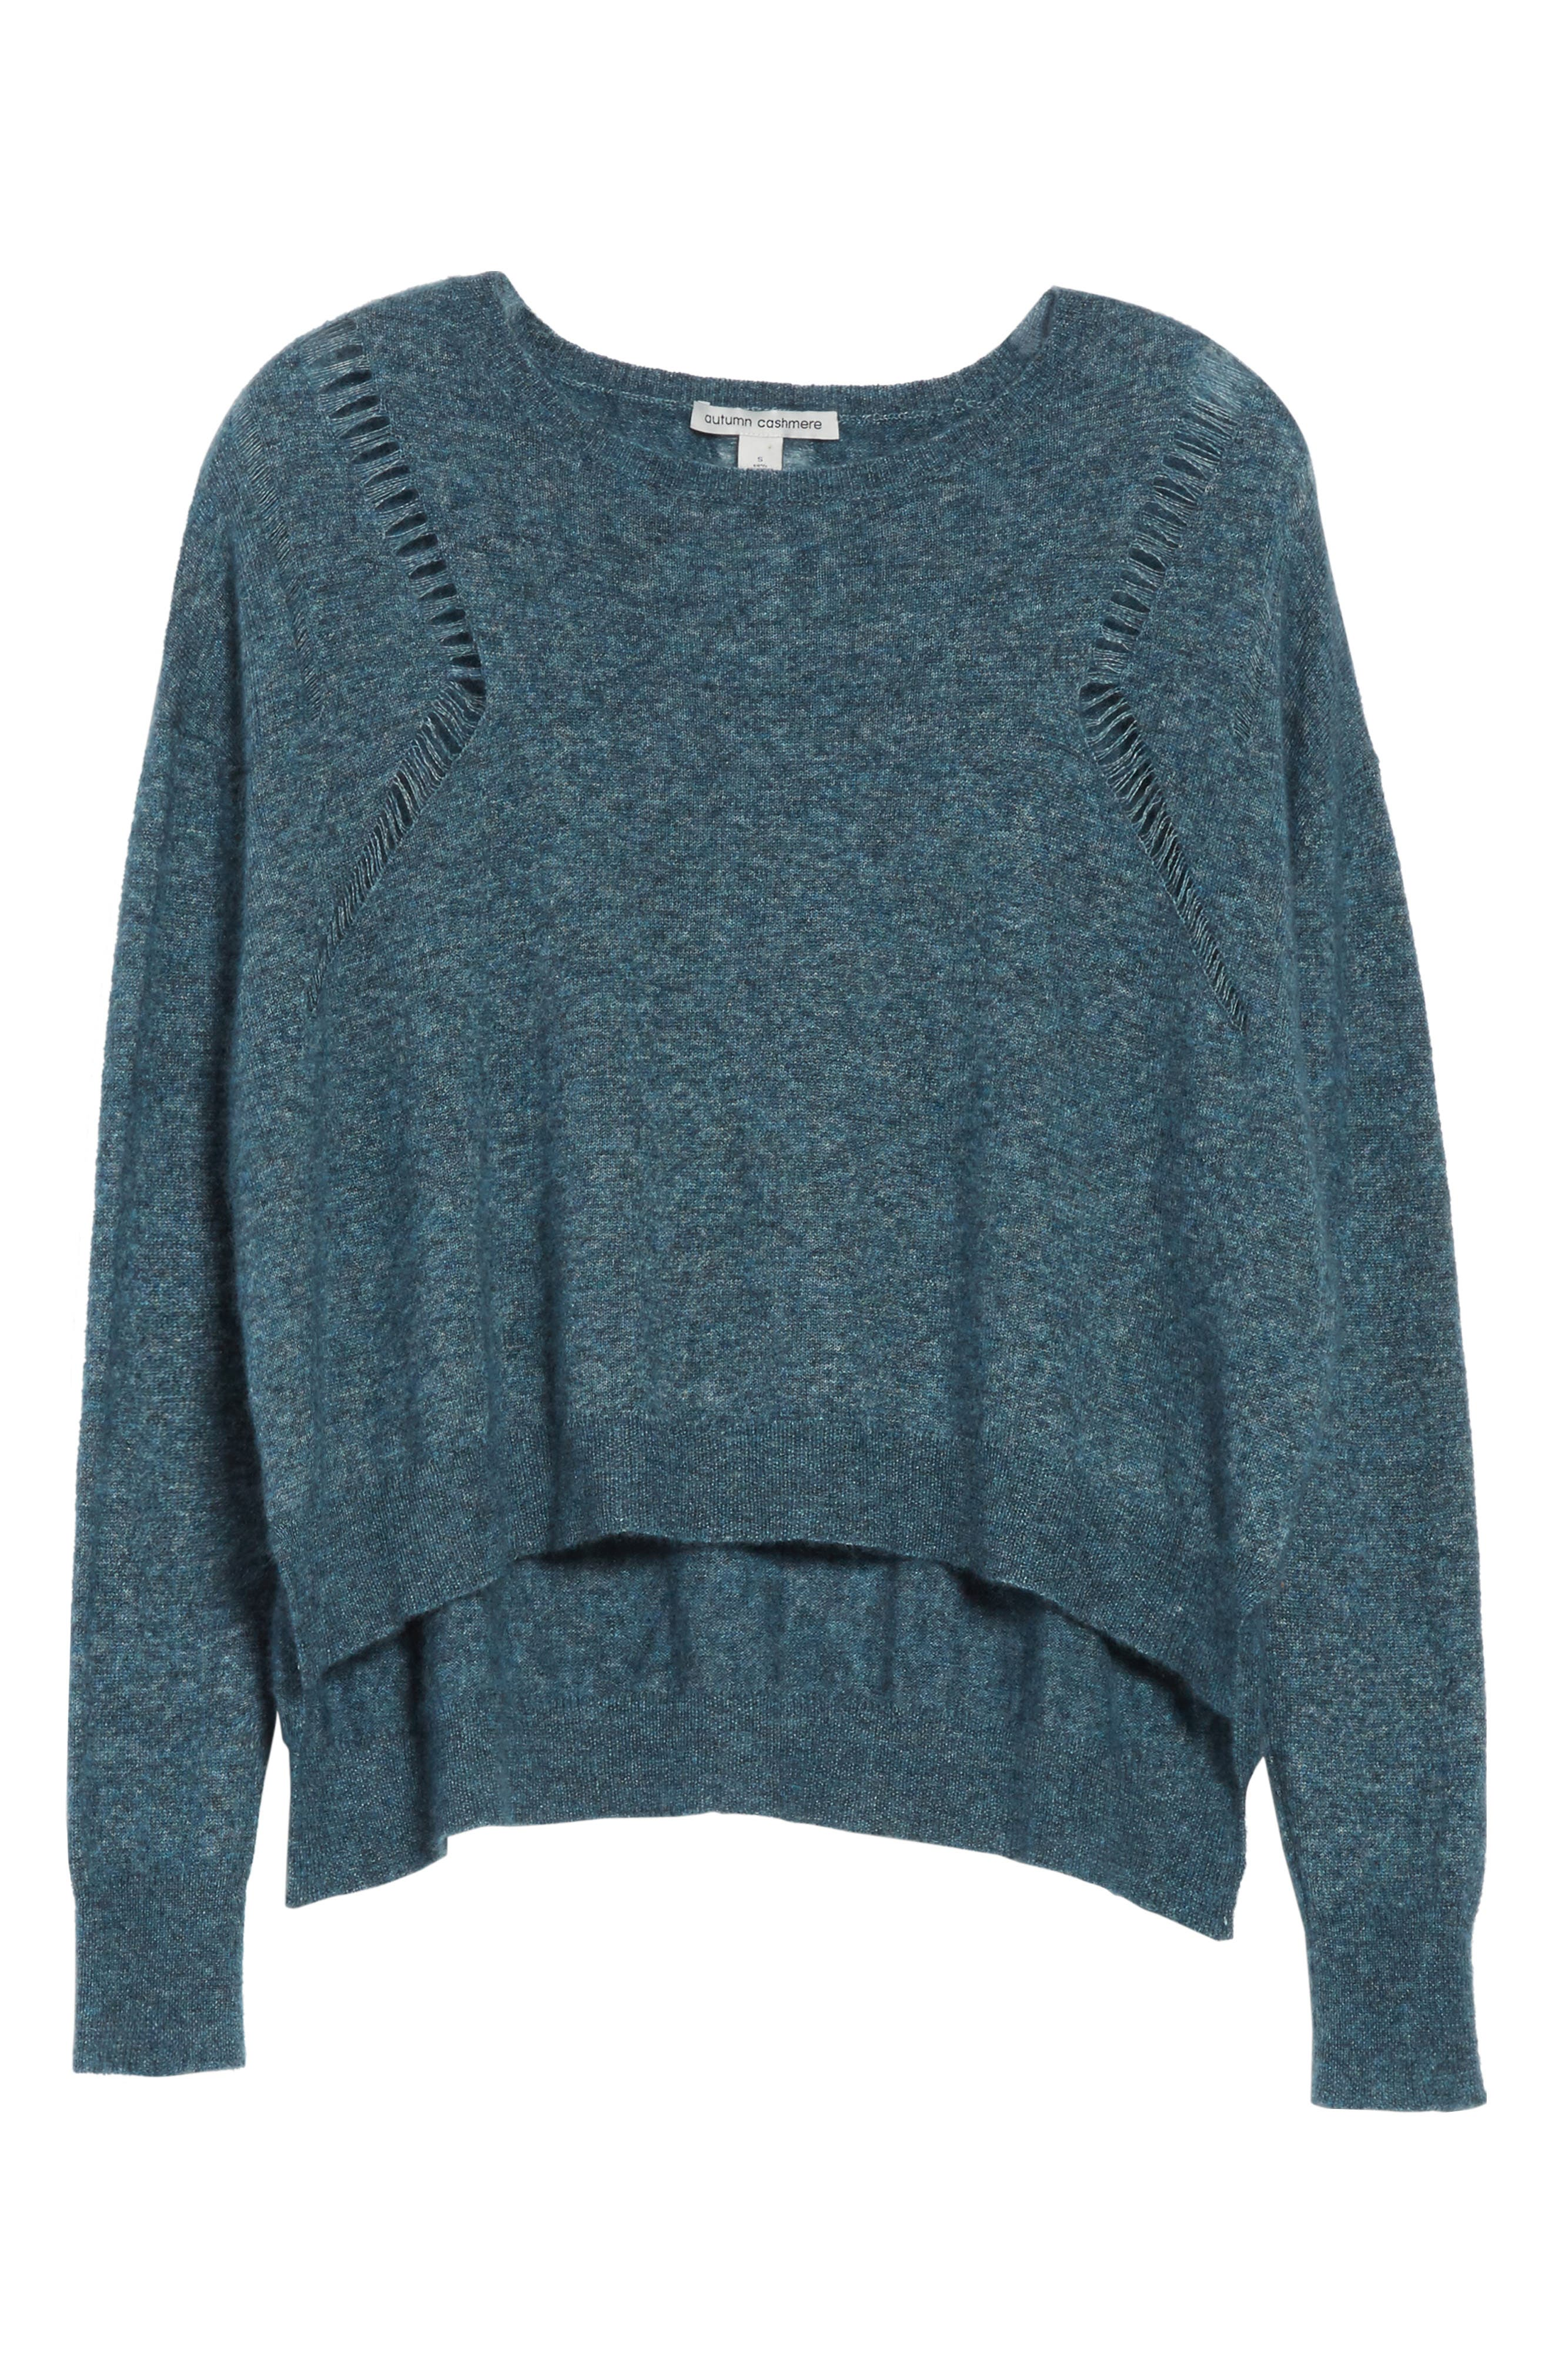 Boxy Ladder Stitch Cashmere & Silk Sweater,                             Alternate thumbnail 6, color,                             256